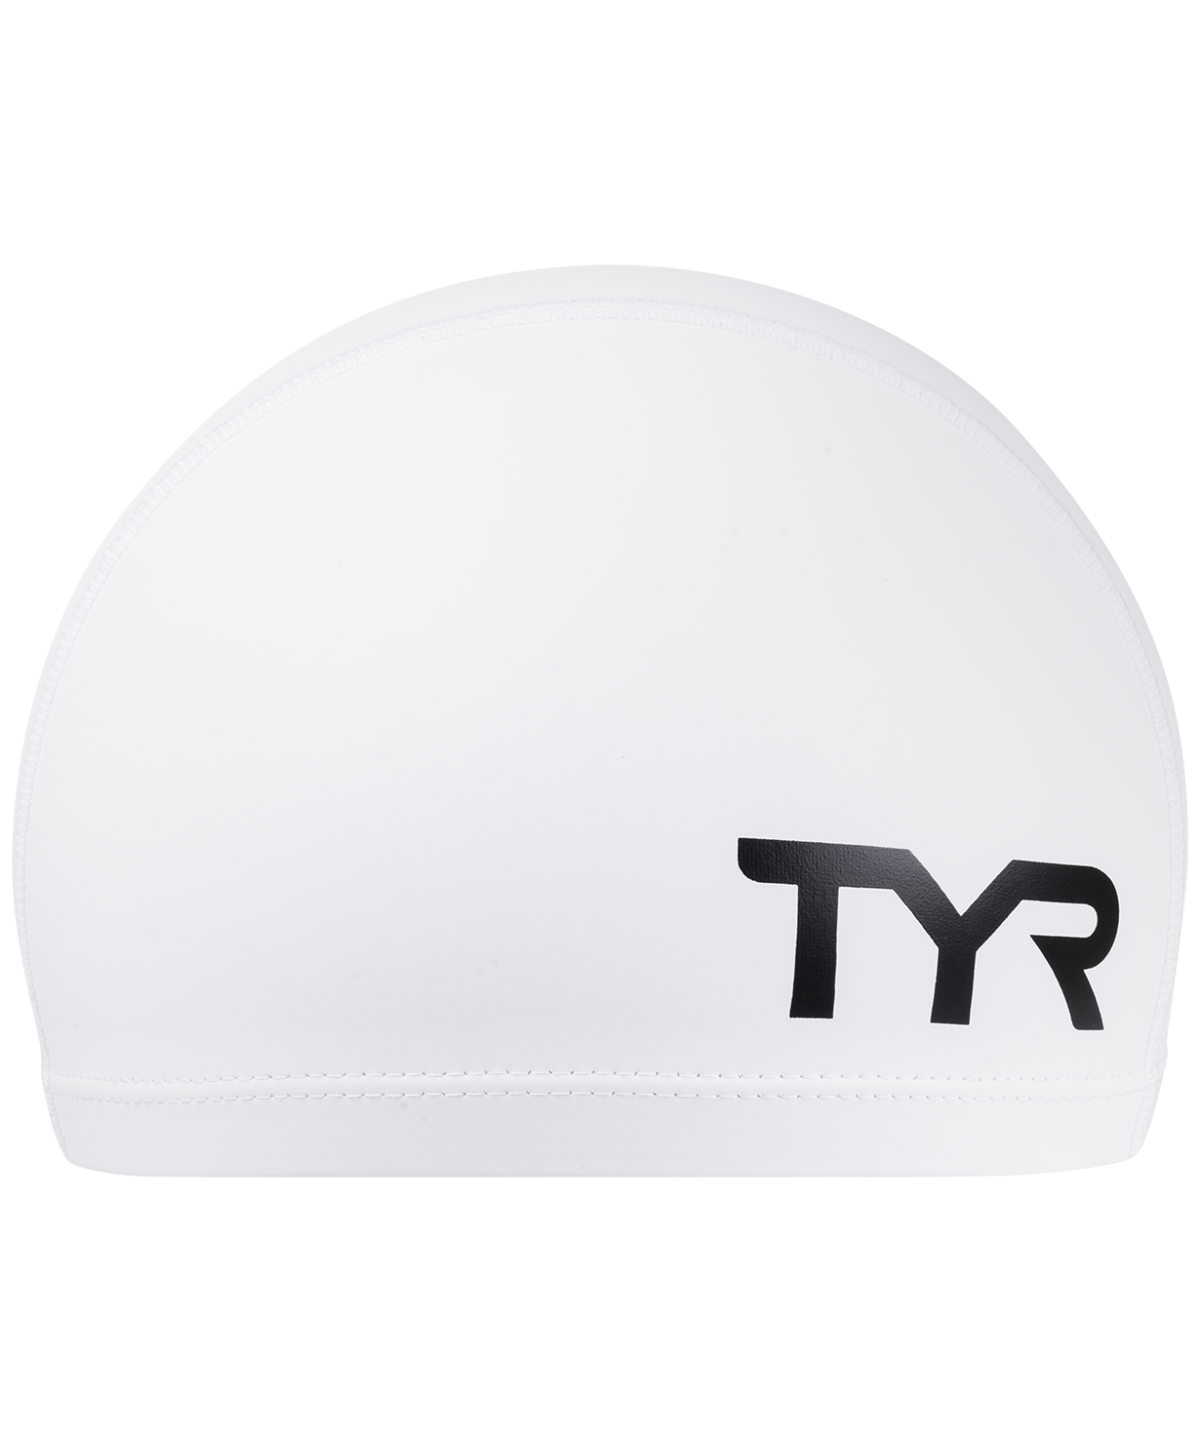 TYR Silicone Comfort Swim Cap Шапочка для плавания  LSCCAP: белый - 2